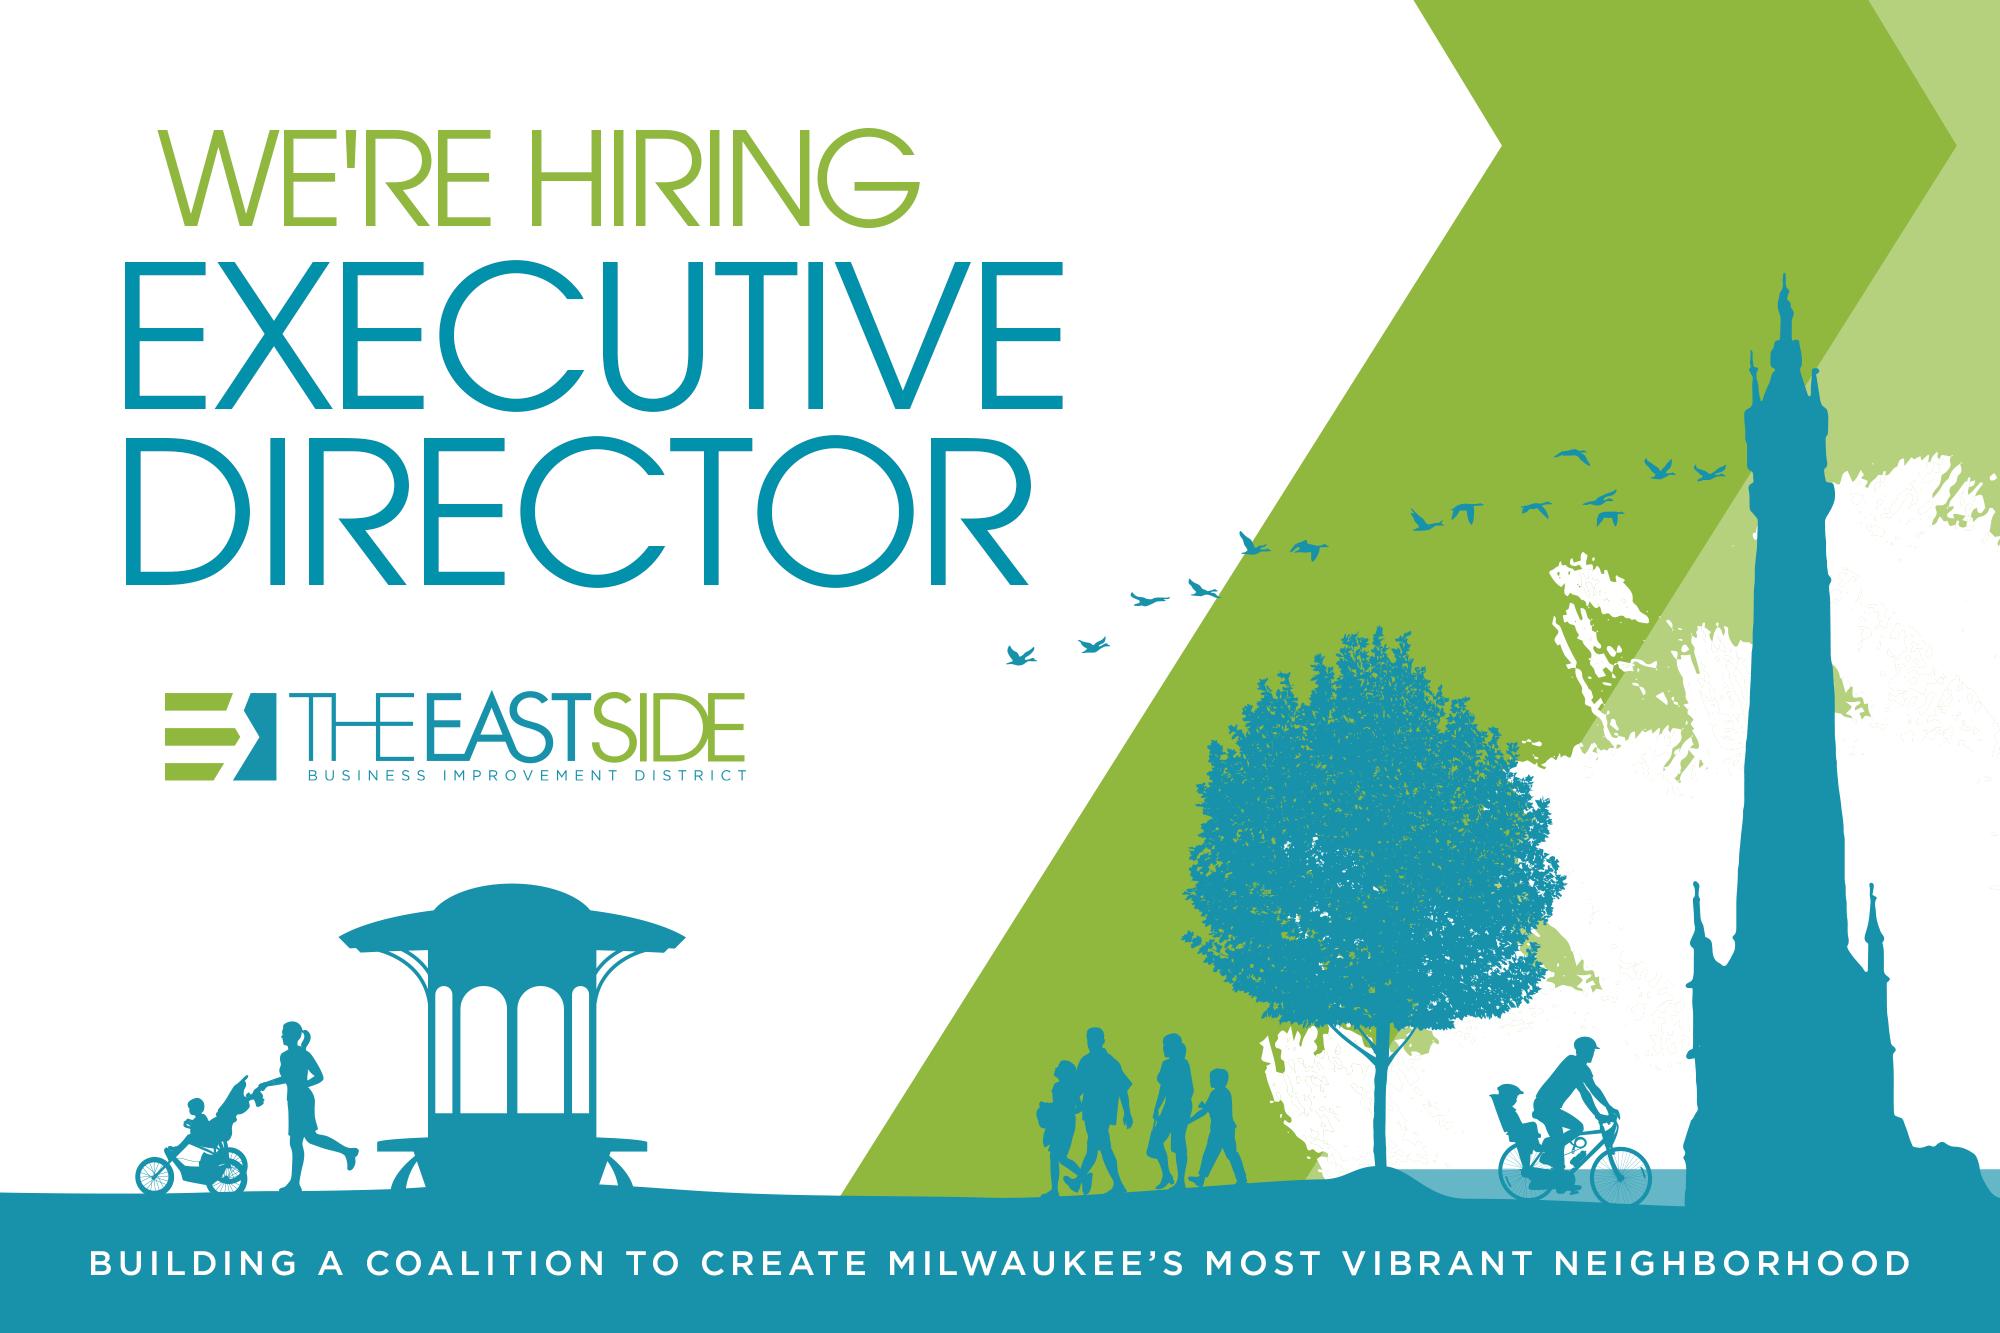 We're Hiring! The East Side BID # 20 Seeks New Executive Director